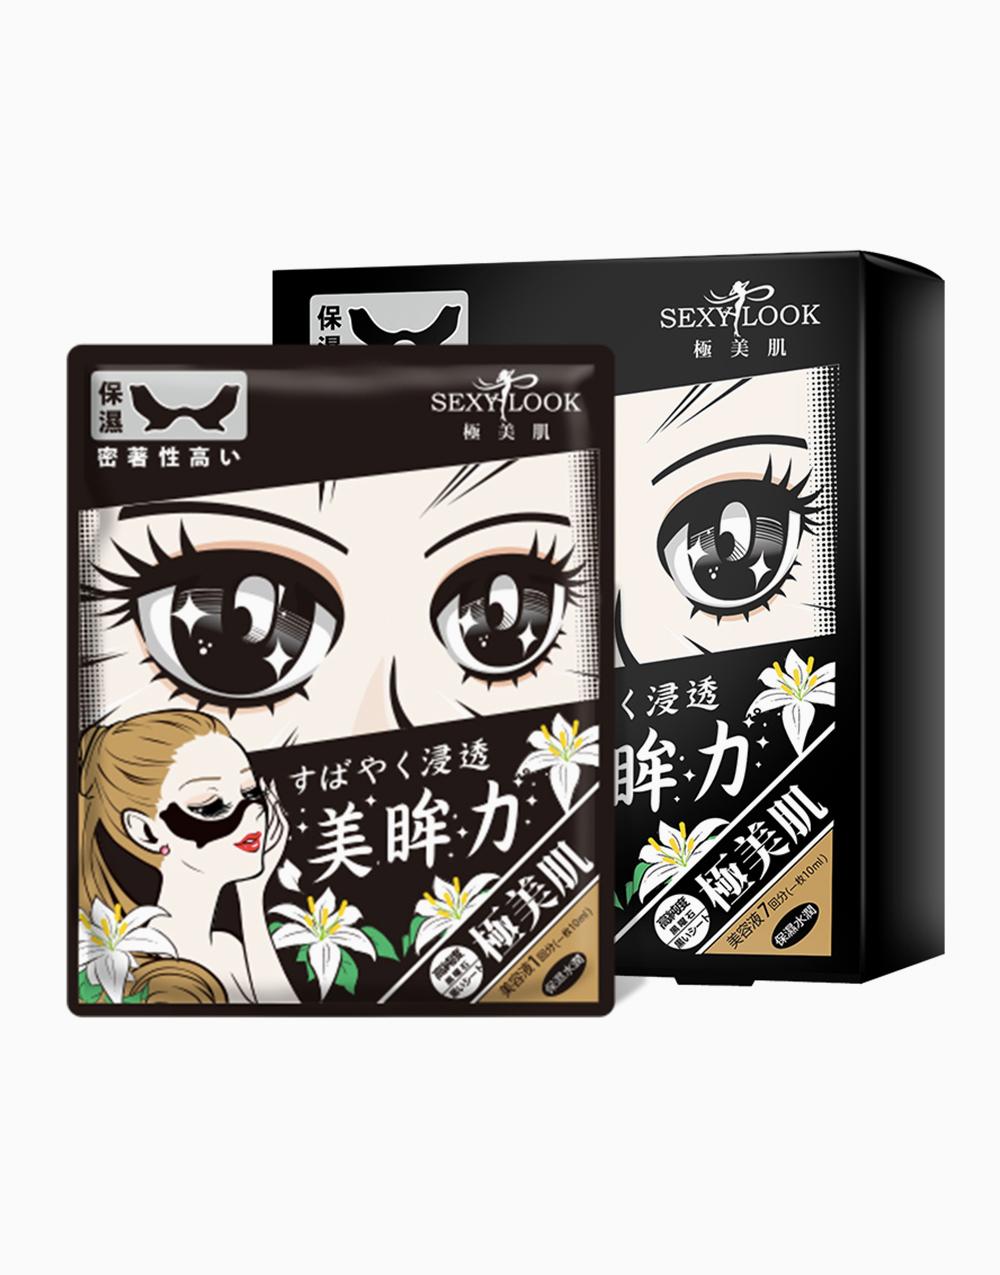 Moisturizing Eye Mask by SEXYLOOK